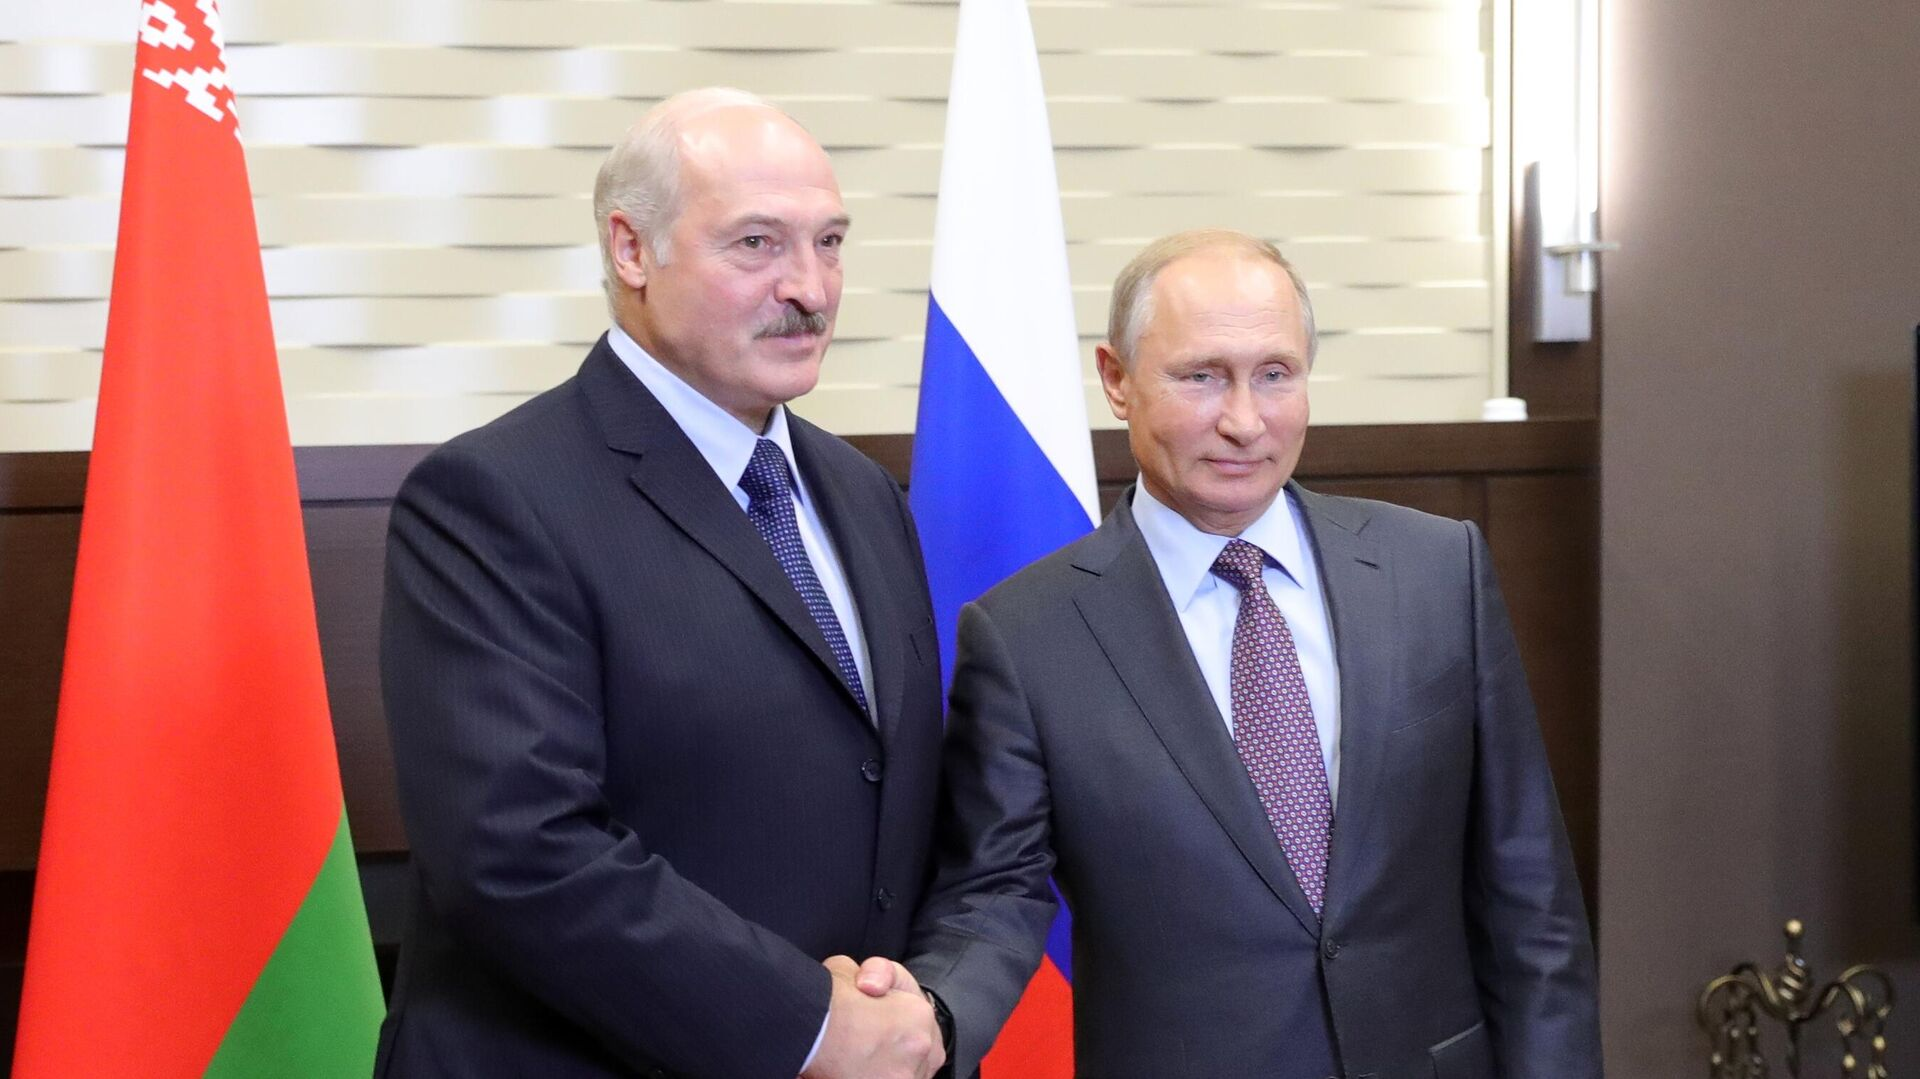 Президент РФ Владимир Путин и президент Белоруссии Александр Лукашенко во время встречи - РИА Новости, 1920, 14.09.2020